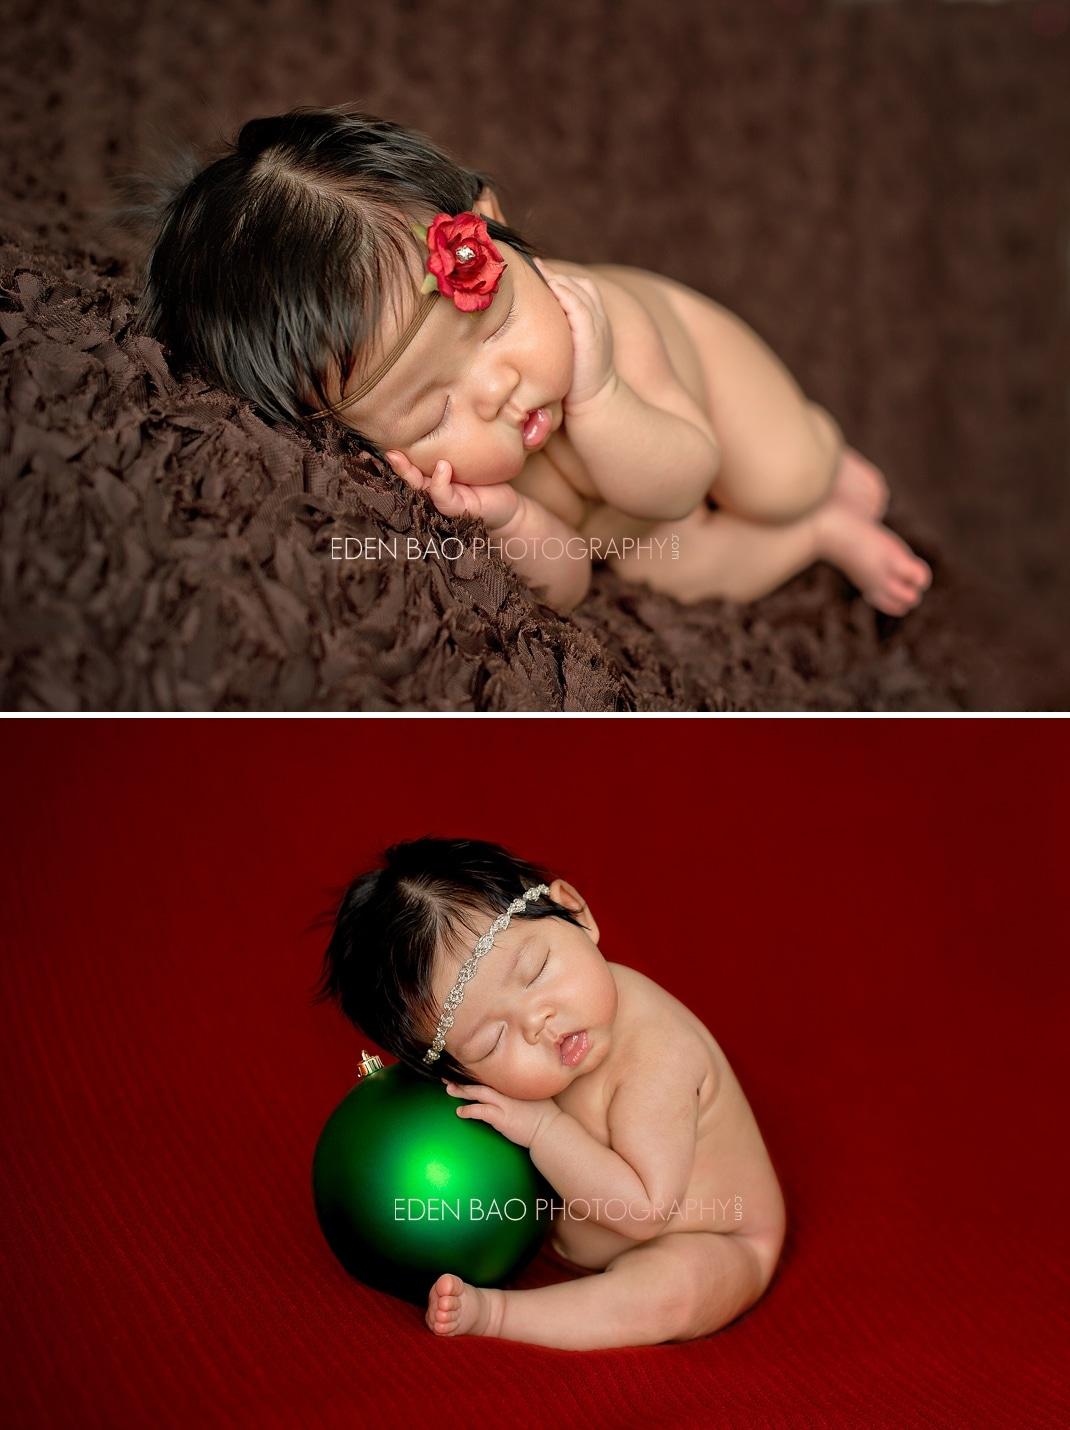 Burnaby BC Newborn Photographer Eden Bao | Mikayla brown red rose headband christmas ornament red